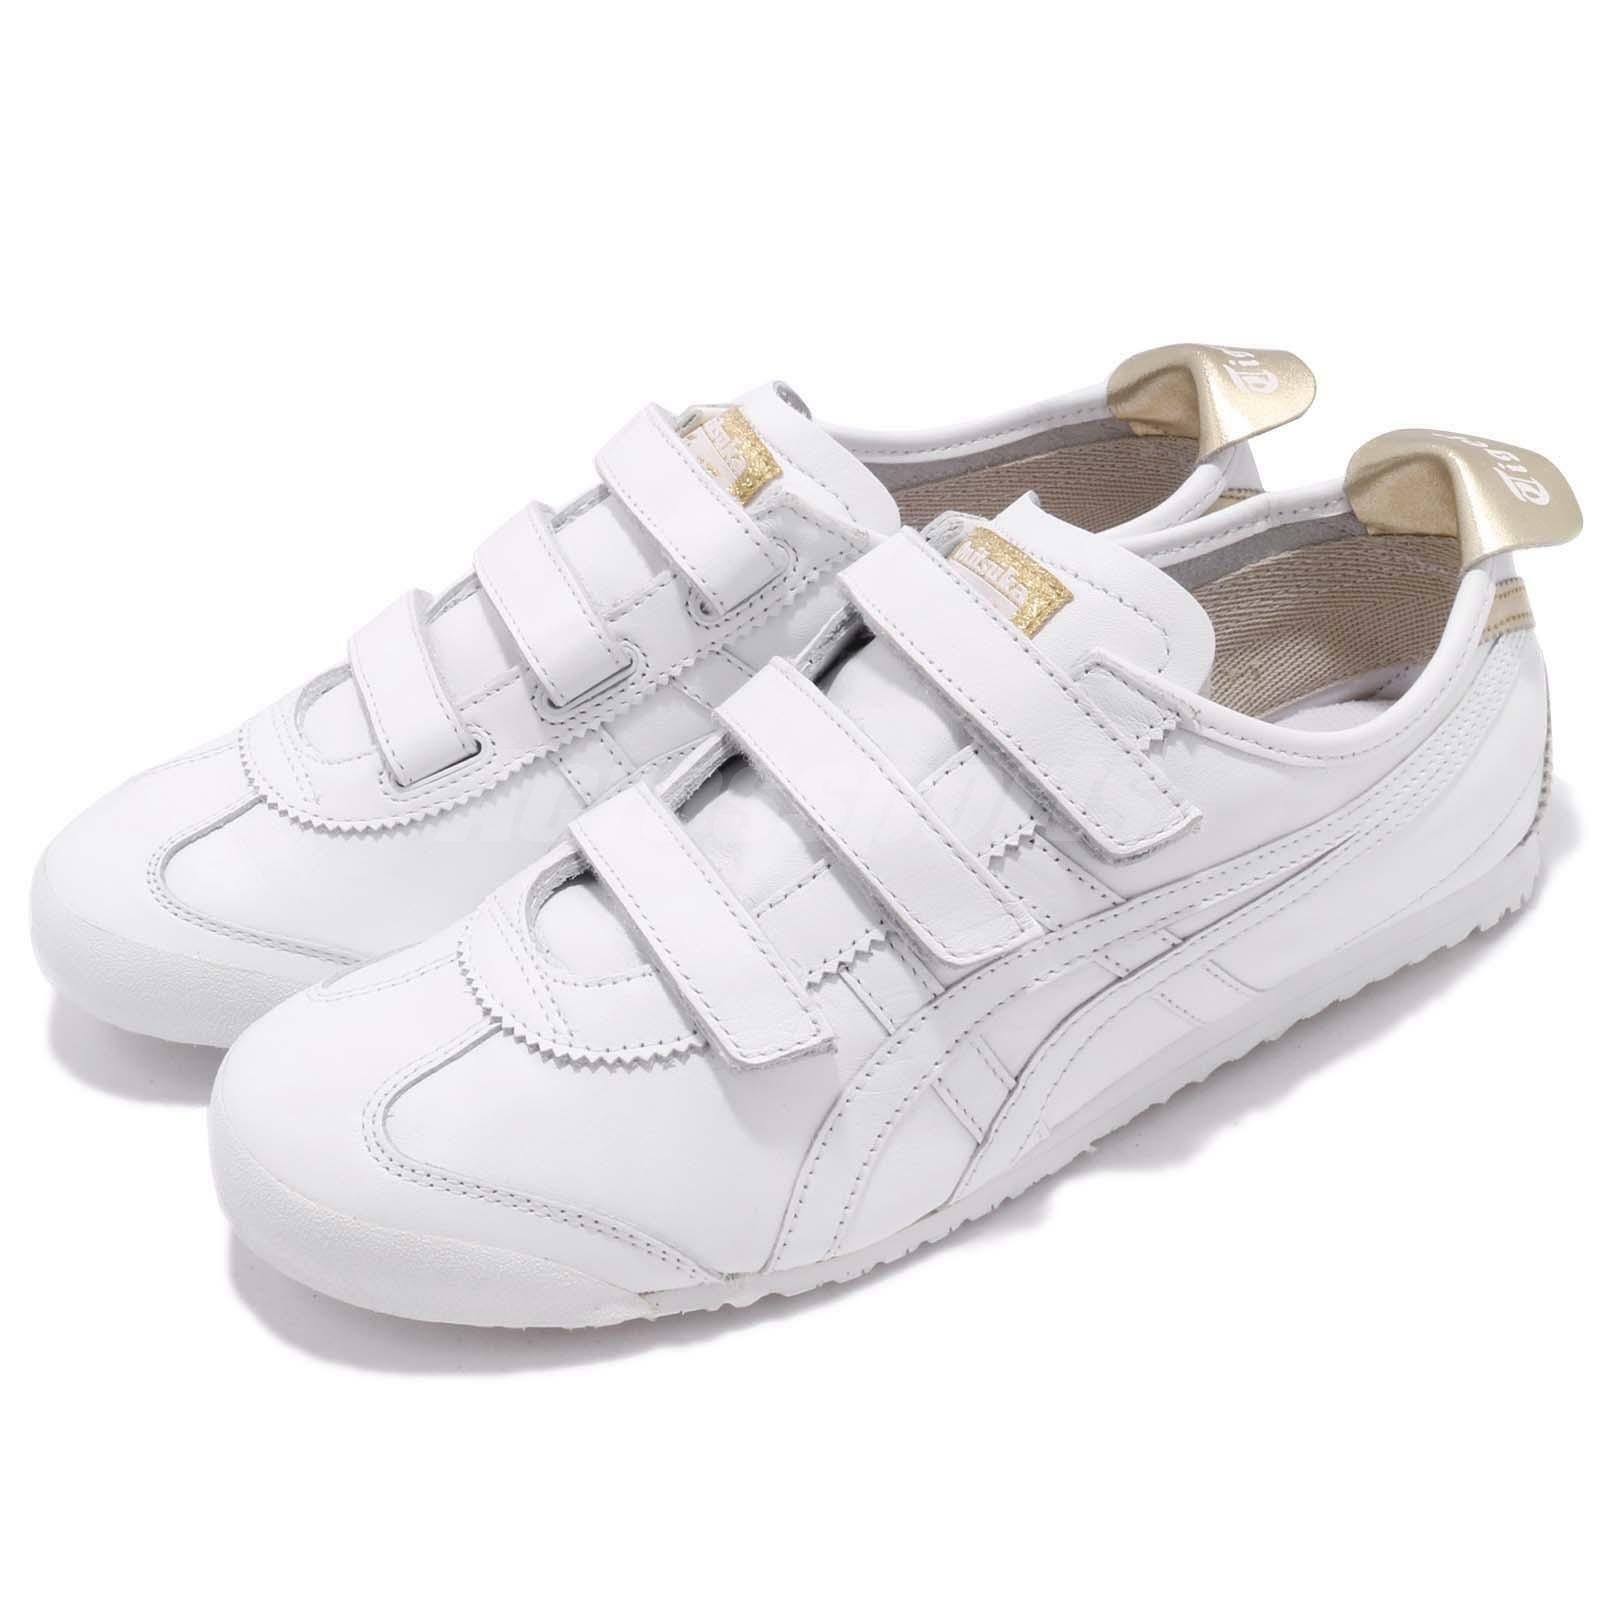 Asics Onitsuka Tiger Mexico 66 Baja Strap blanc or Men chaussures baskets HK4A1-0194